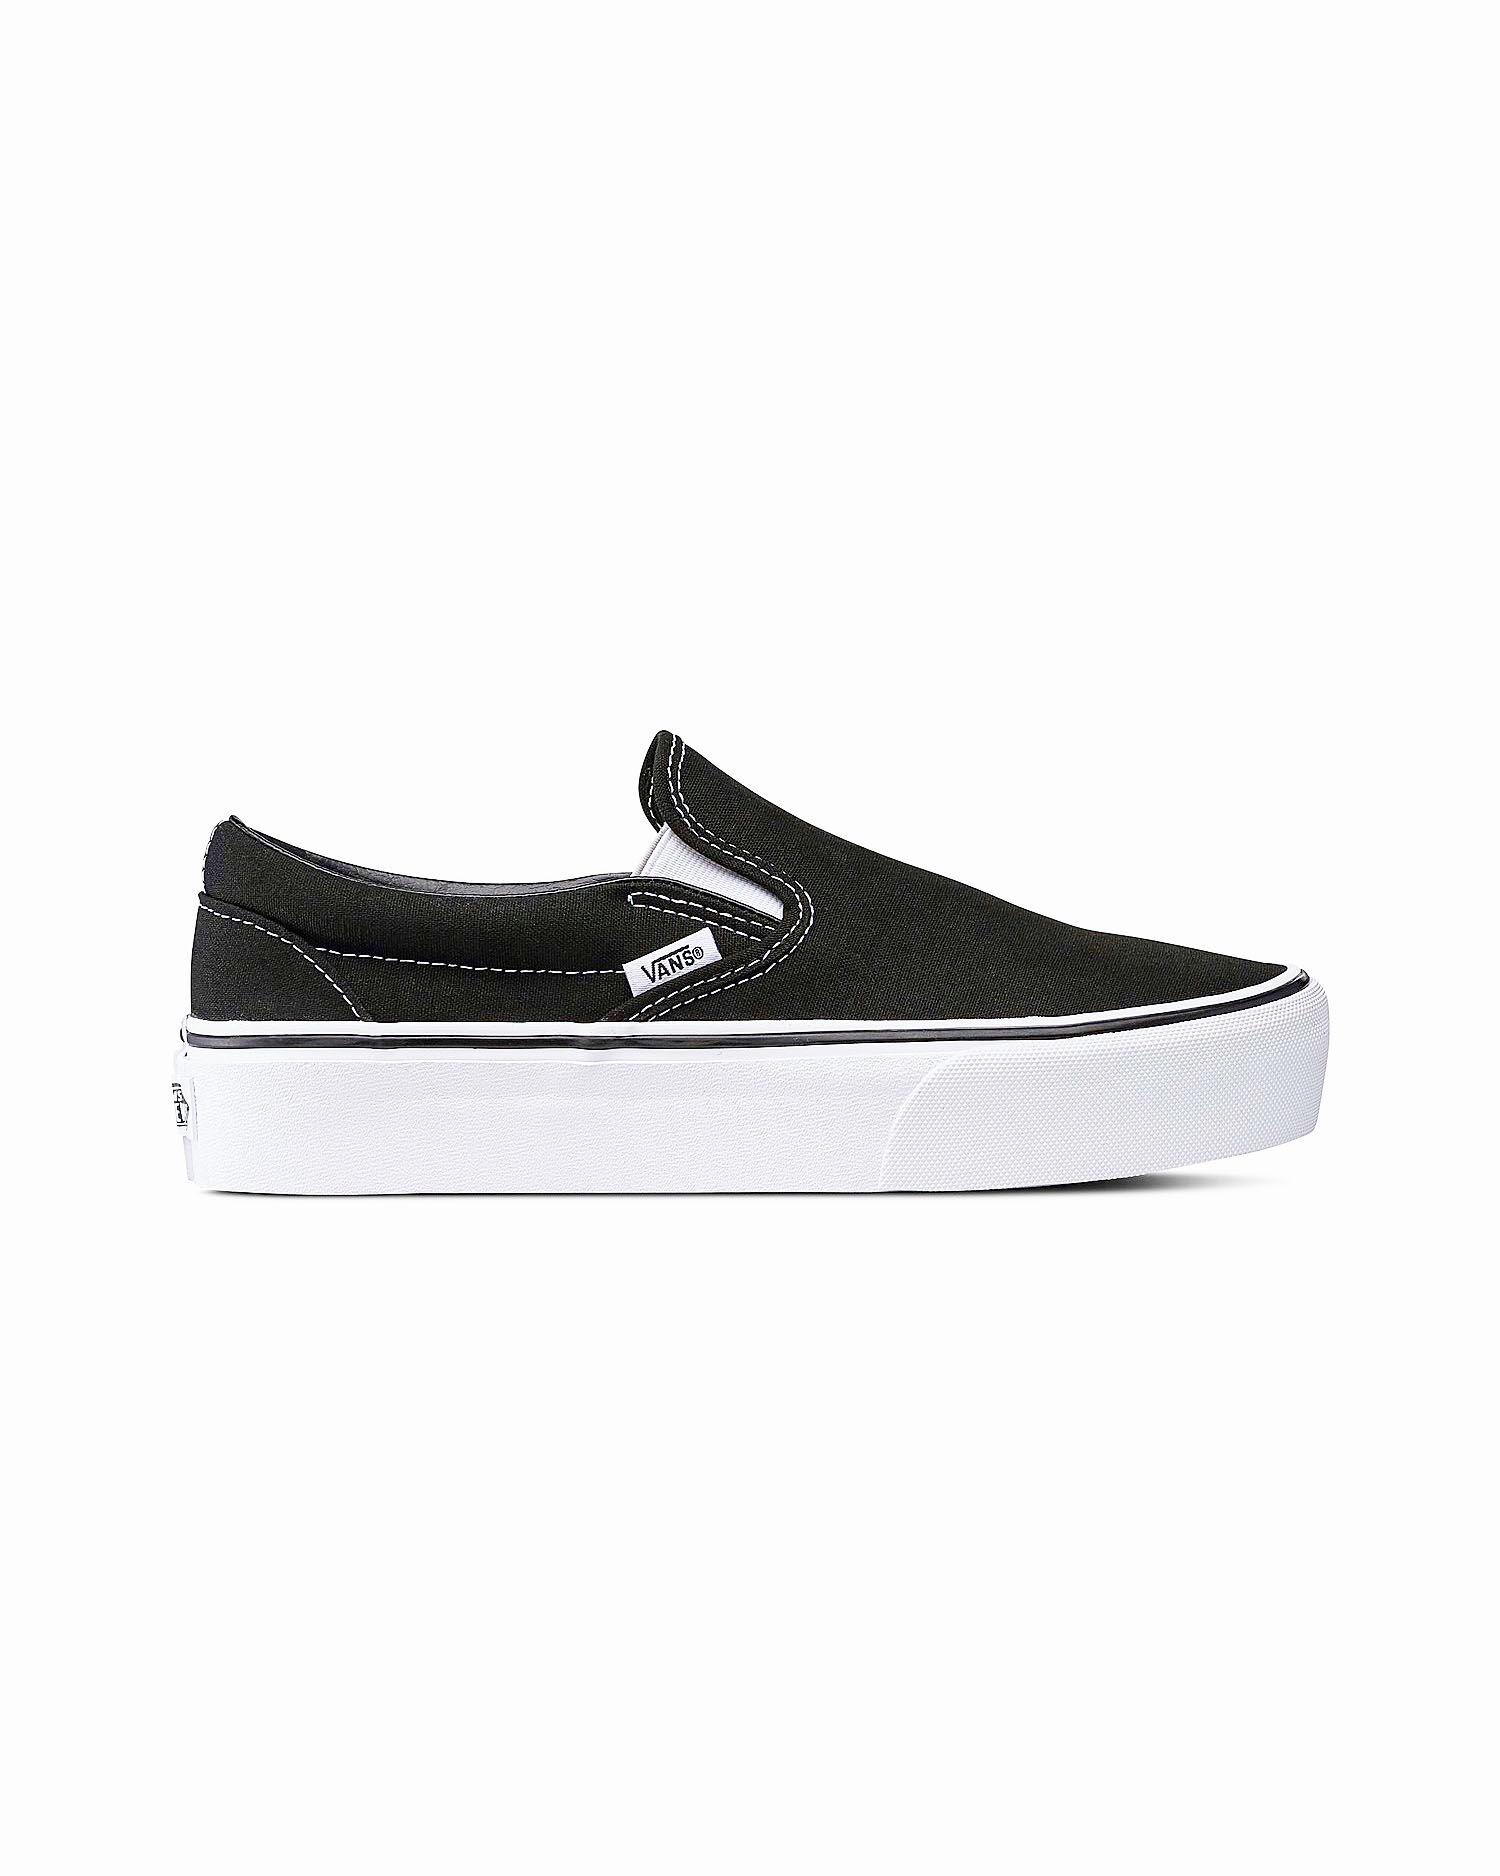 Vans - Classic Slip-On Platform Black 38,5